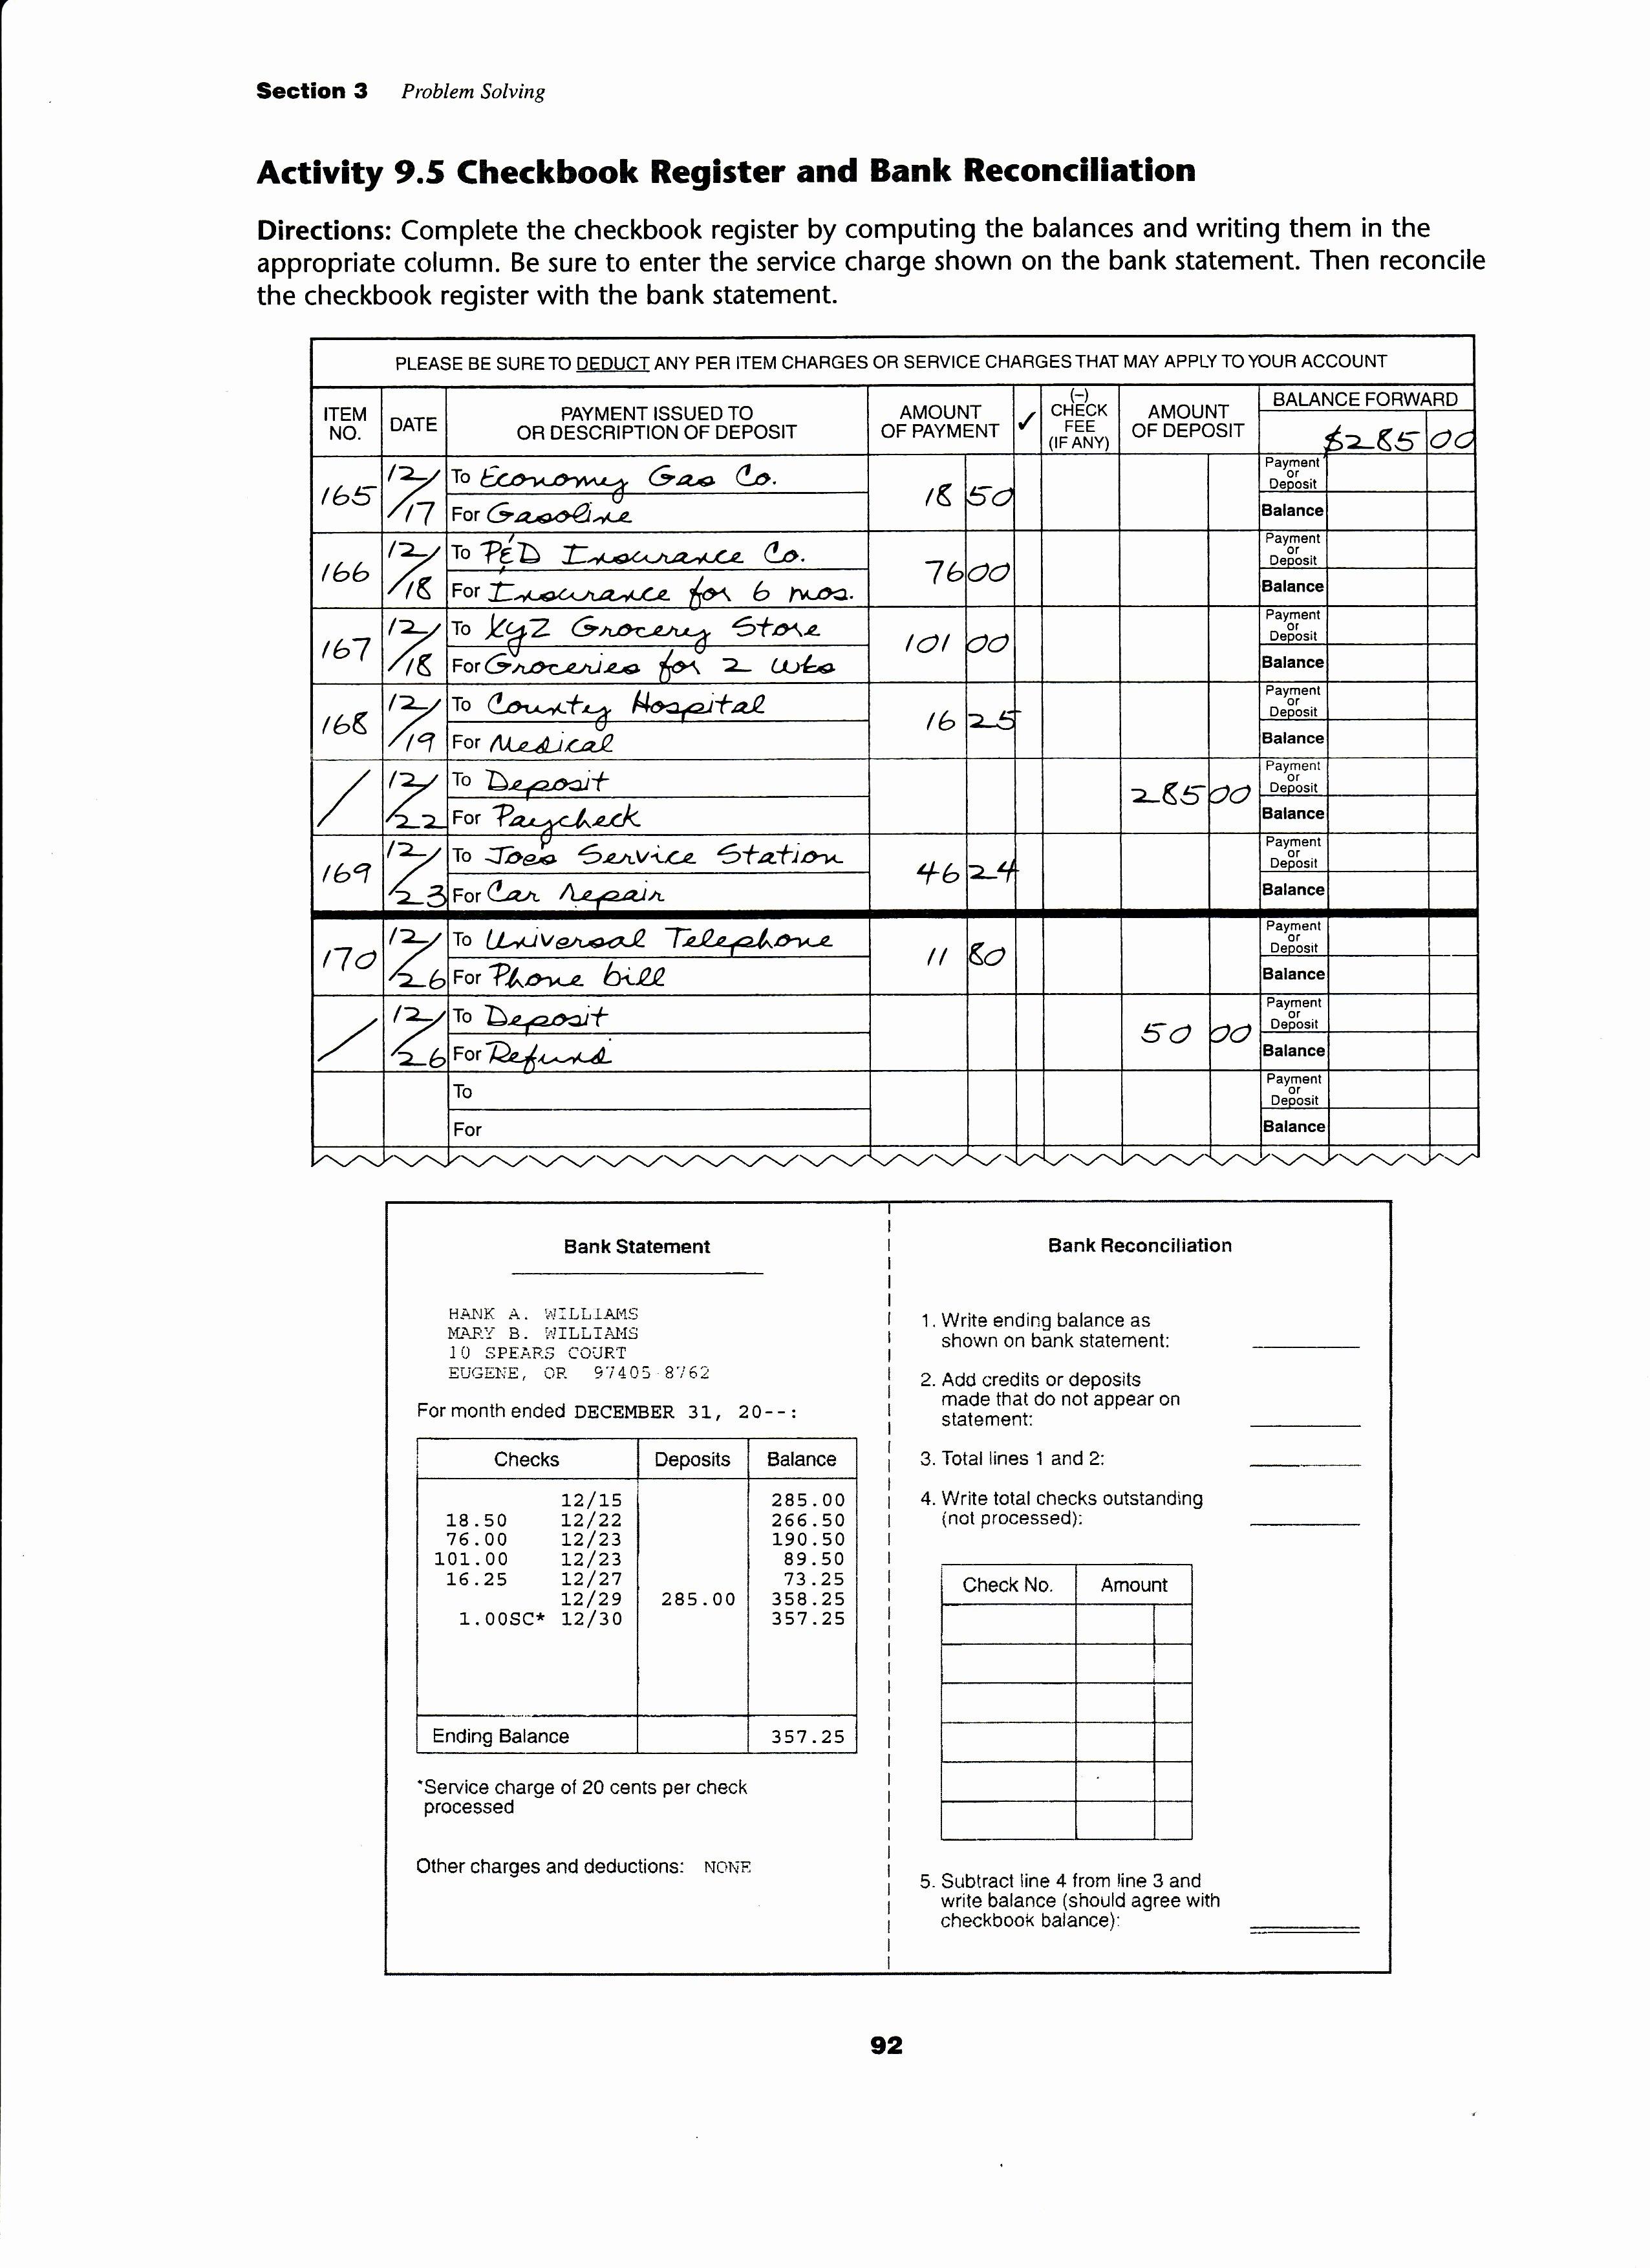 Reconciling A Bank Statement Worksheet Elegant Reconciling A Bank Statement Worksheet the Best Worksheets